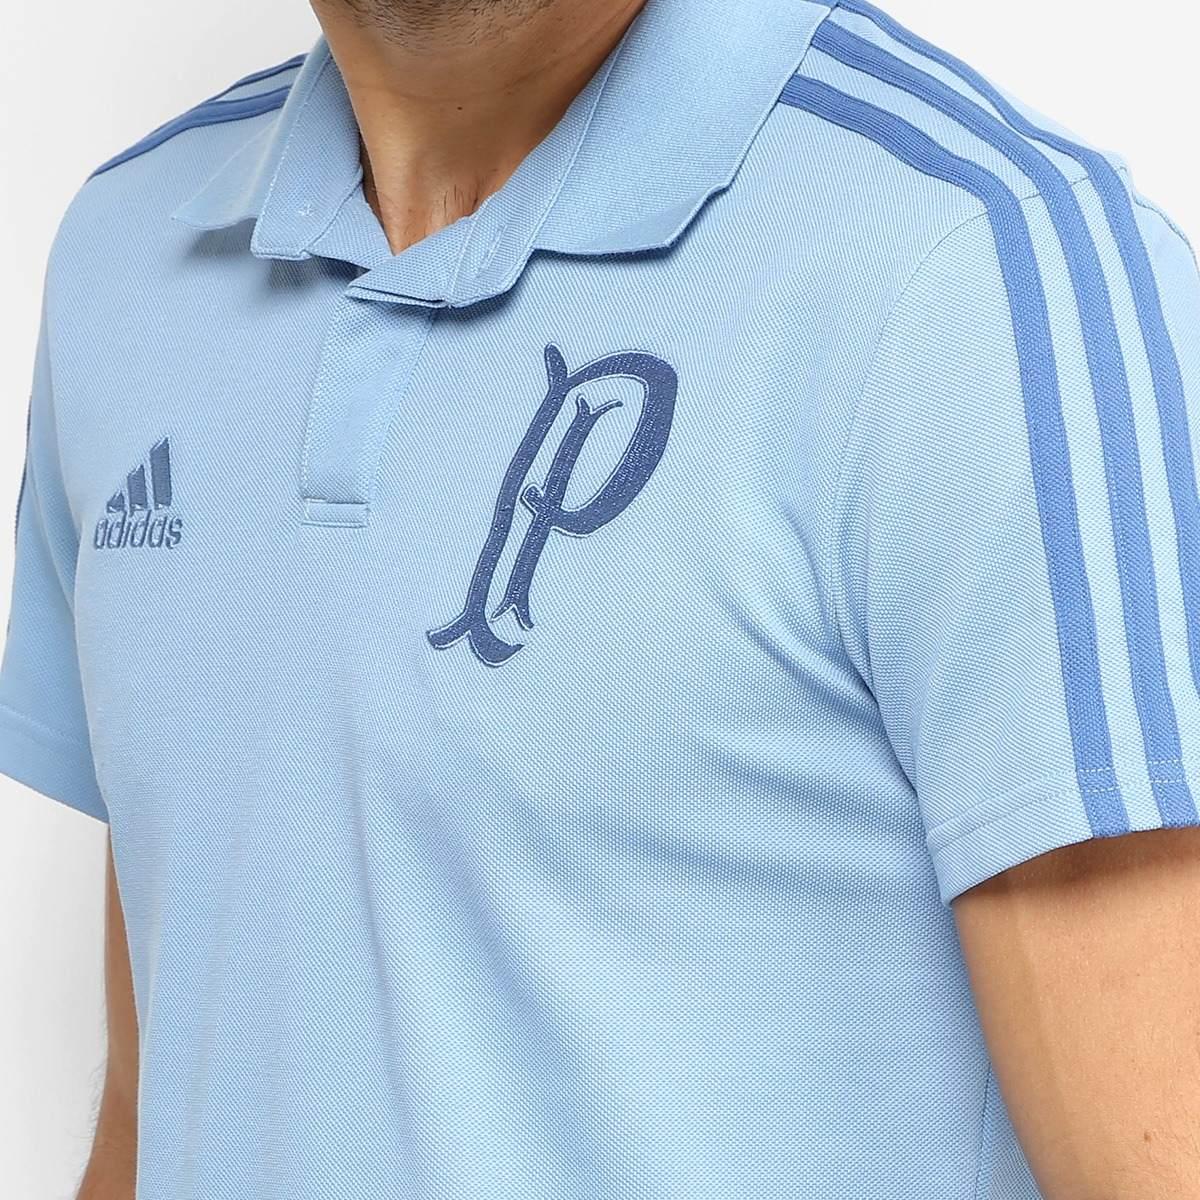 camisa polo palmeiras adidas cotton masculina. Carregando zoom. b4d14addee9c9